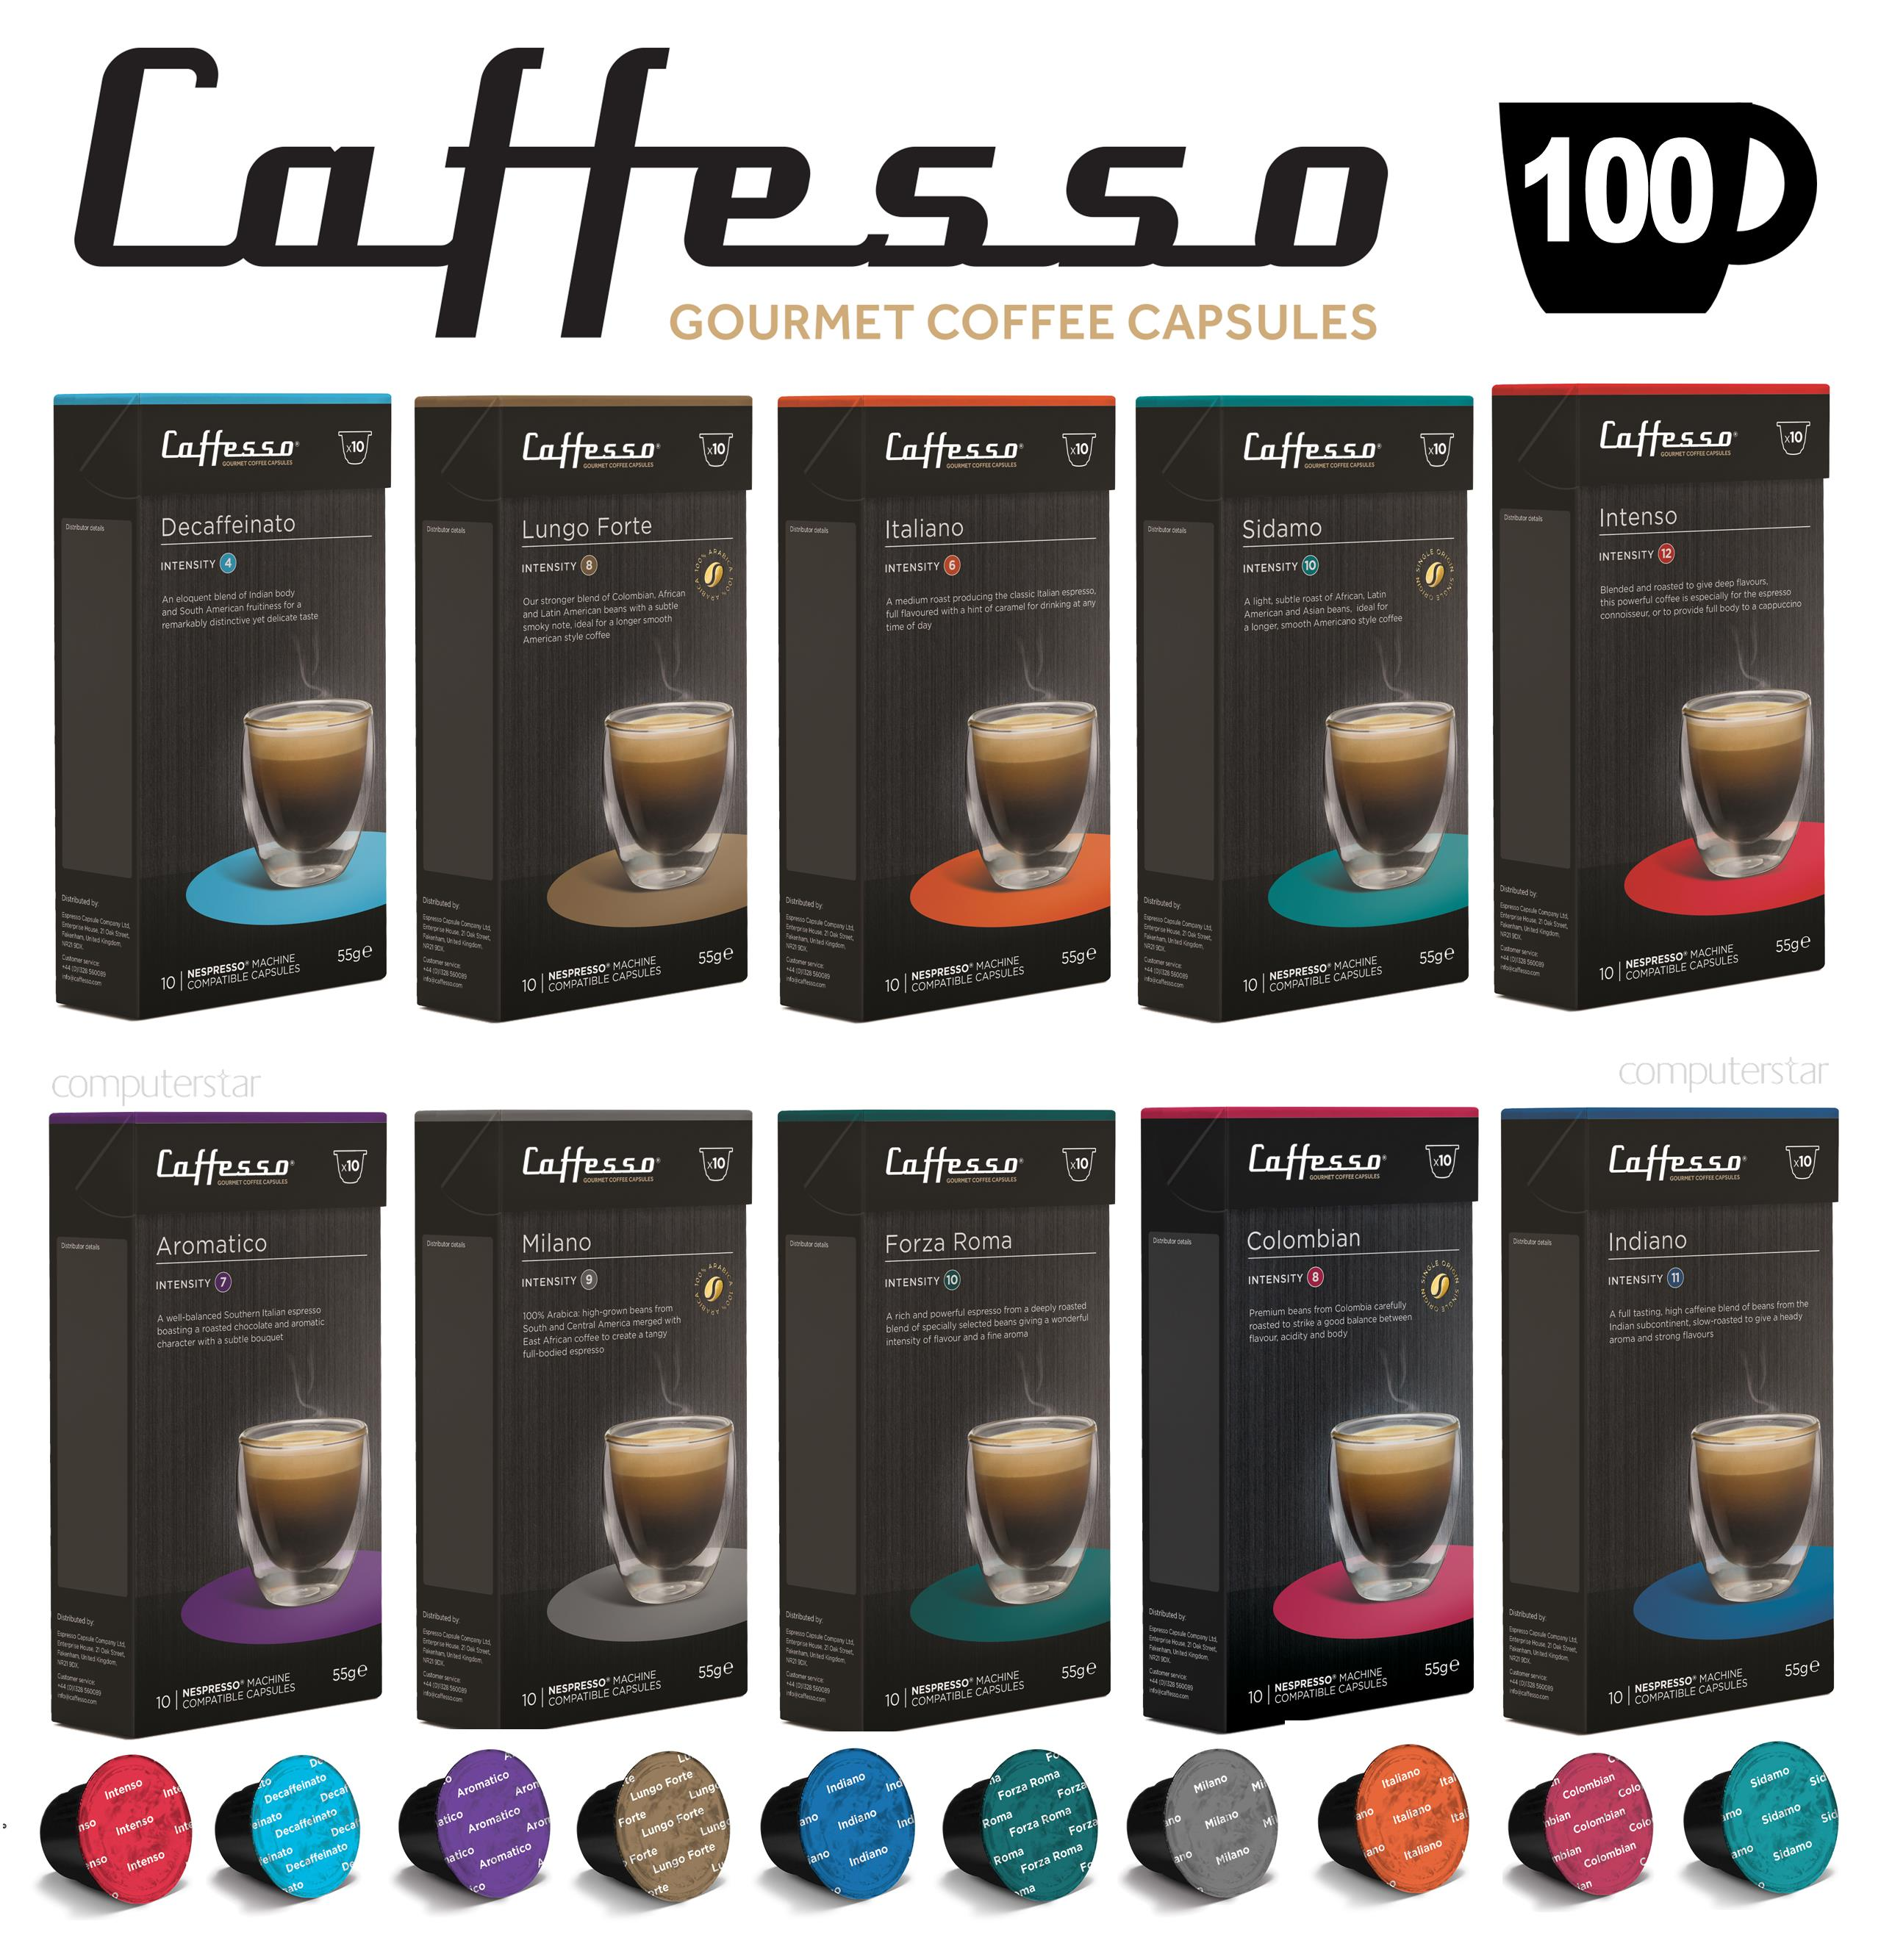 100 x caffesso nespresso compatible coffee capsules 10 blend selection pack ebay. Black Bedroom Furniture Sets. Home Design Ideas